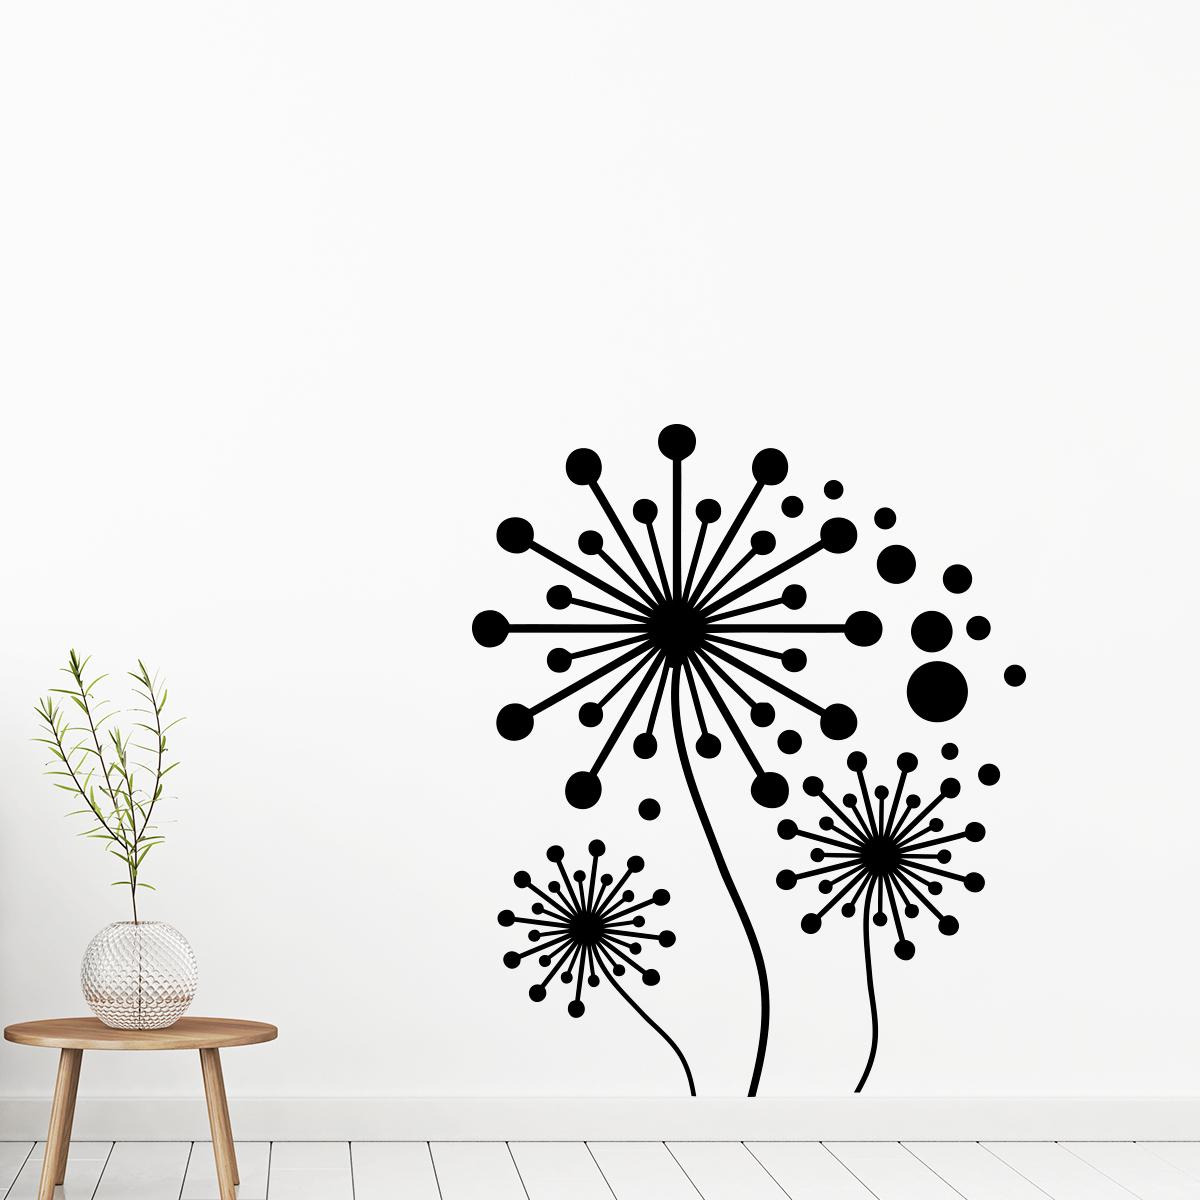 sticker fleurs pissenlits artistique stickers art et design artistiques ambiance sticker. Black Bedroom Furniture Sets. Home Design Ideas